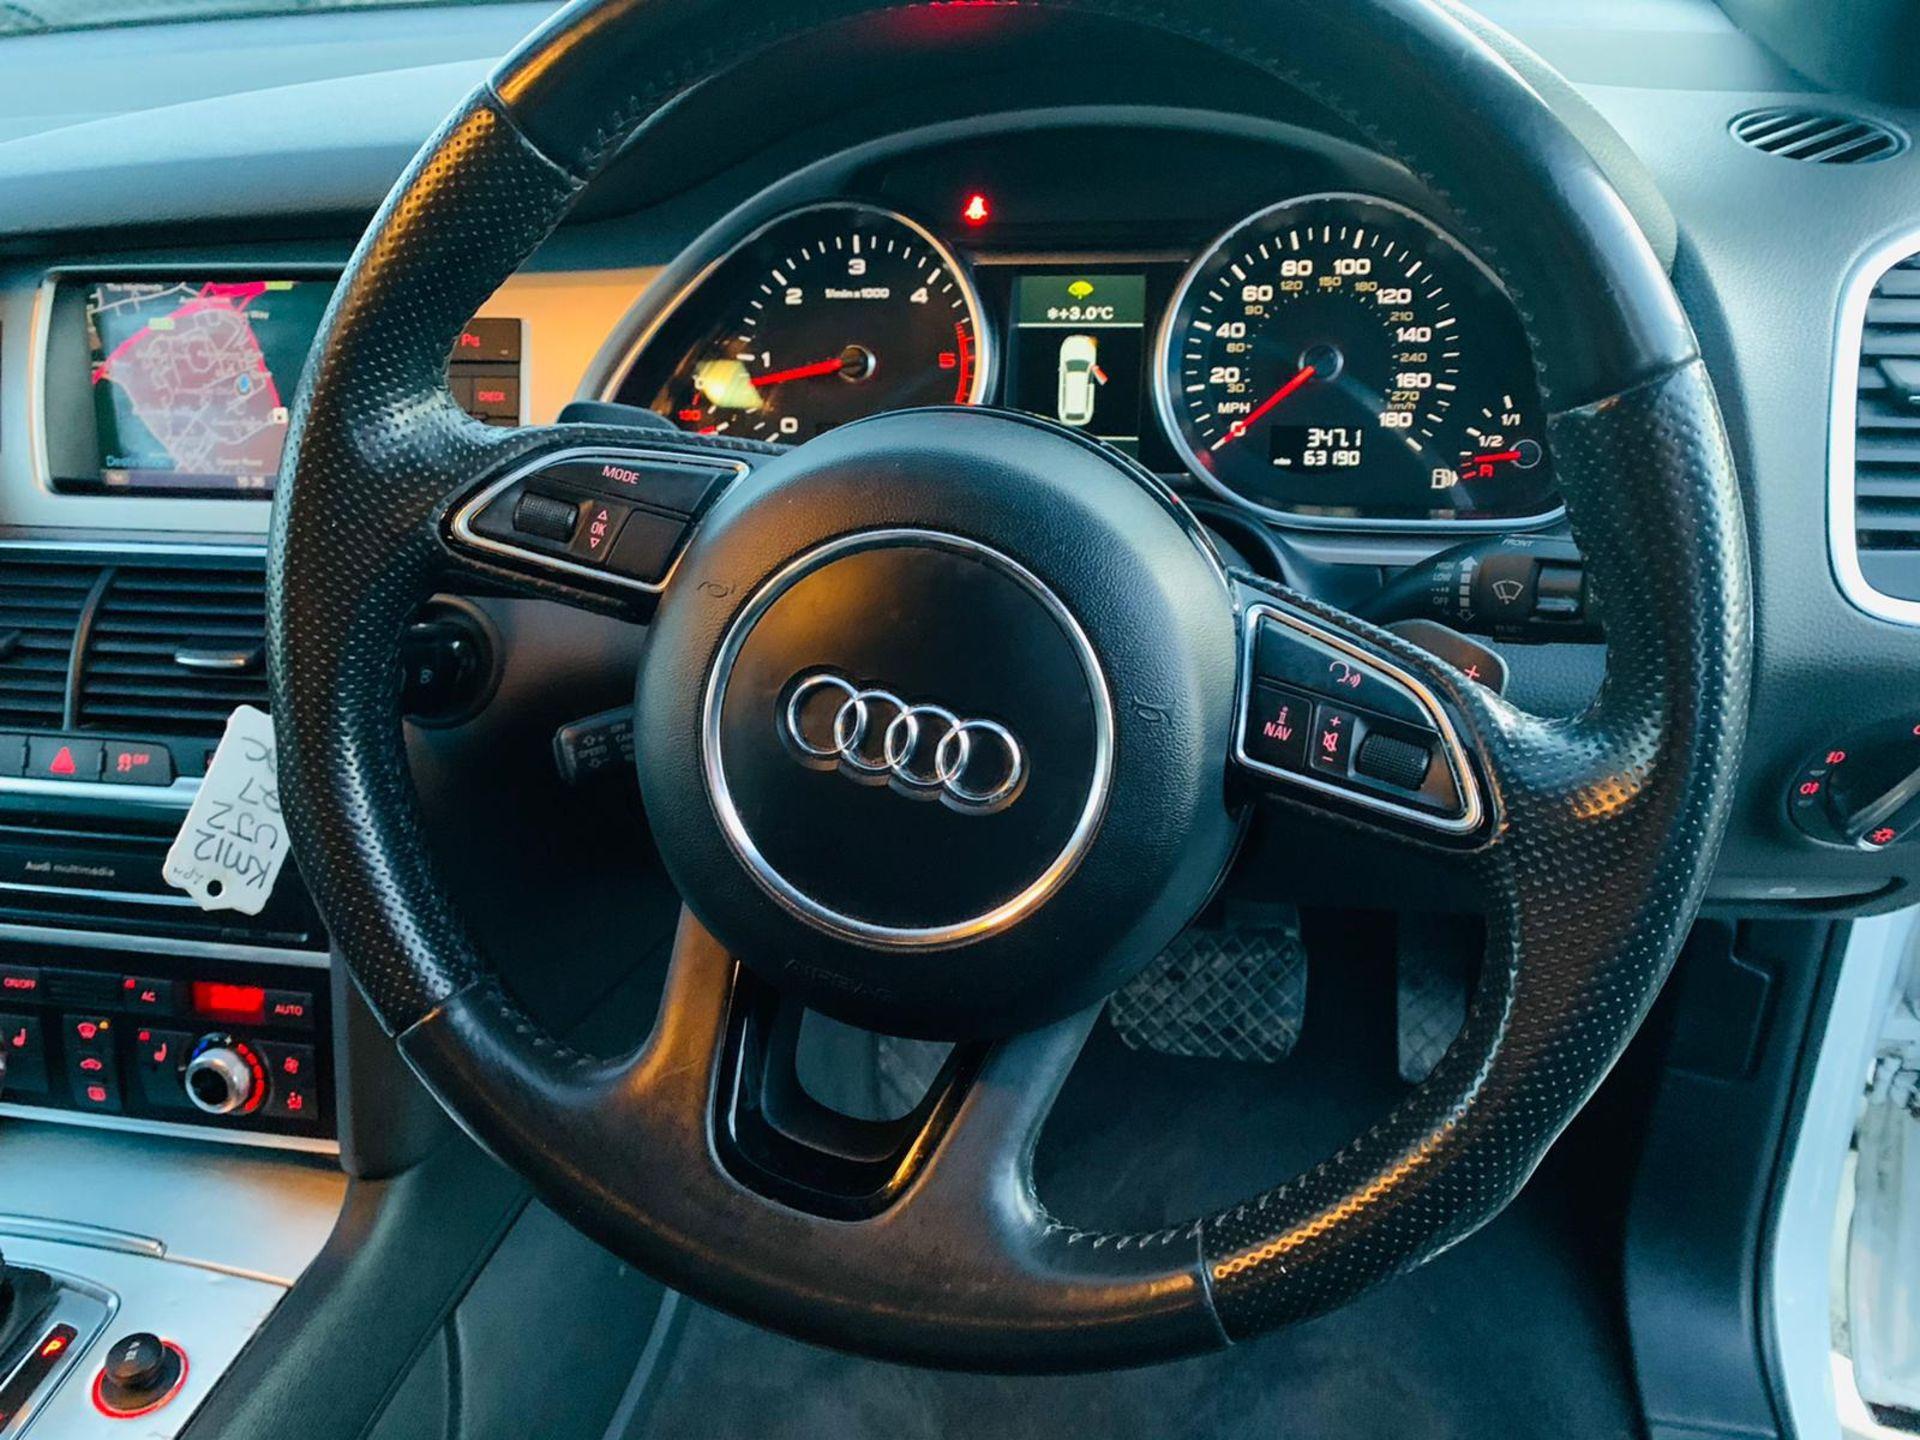 (Reserve Met)Audi Q7 3.0 TDI Quattro S Line Plus Auto (7 Seats) - 12 Reg - Only 63k Miles -Sat Nav- - Image 22 of 37